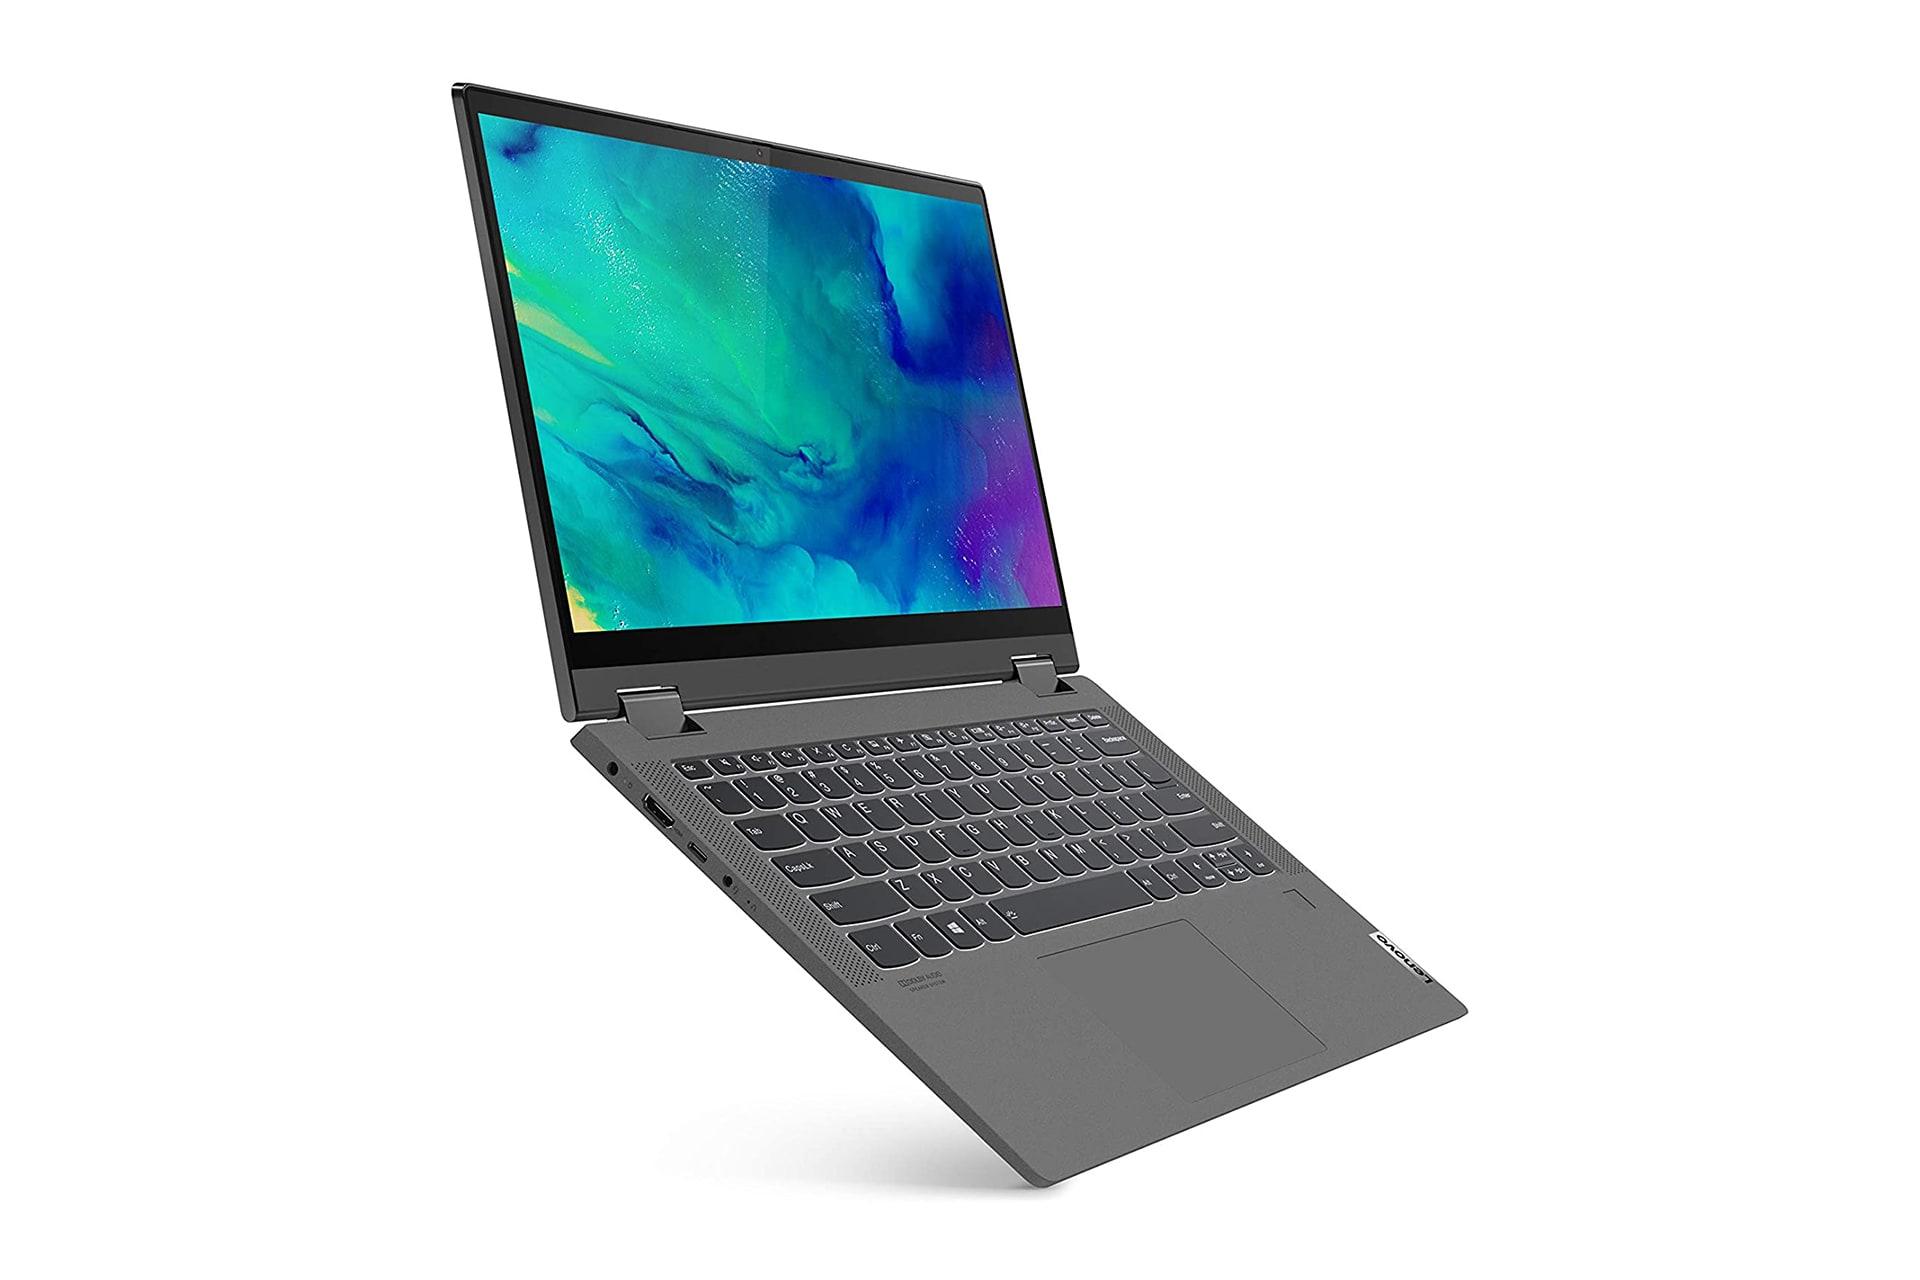 Lenovo Flex 5 81X20005US 2-in-1 Laptop Review